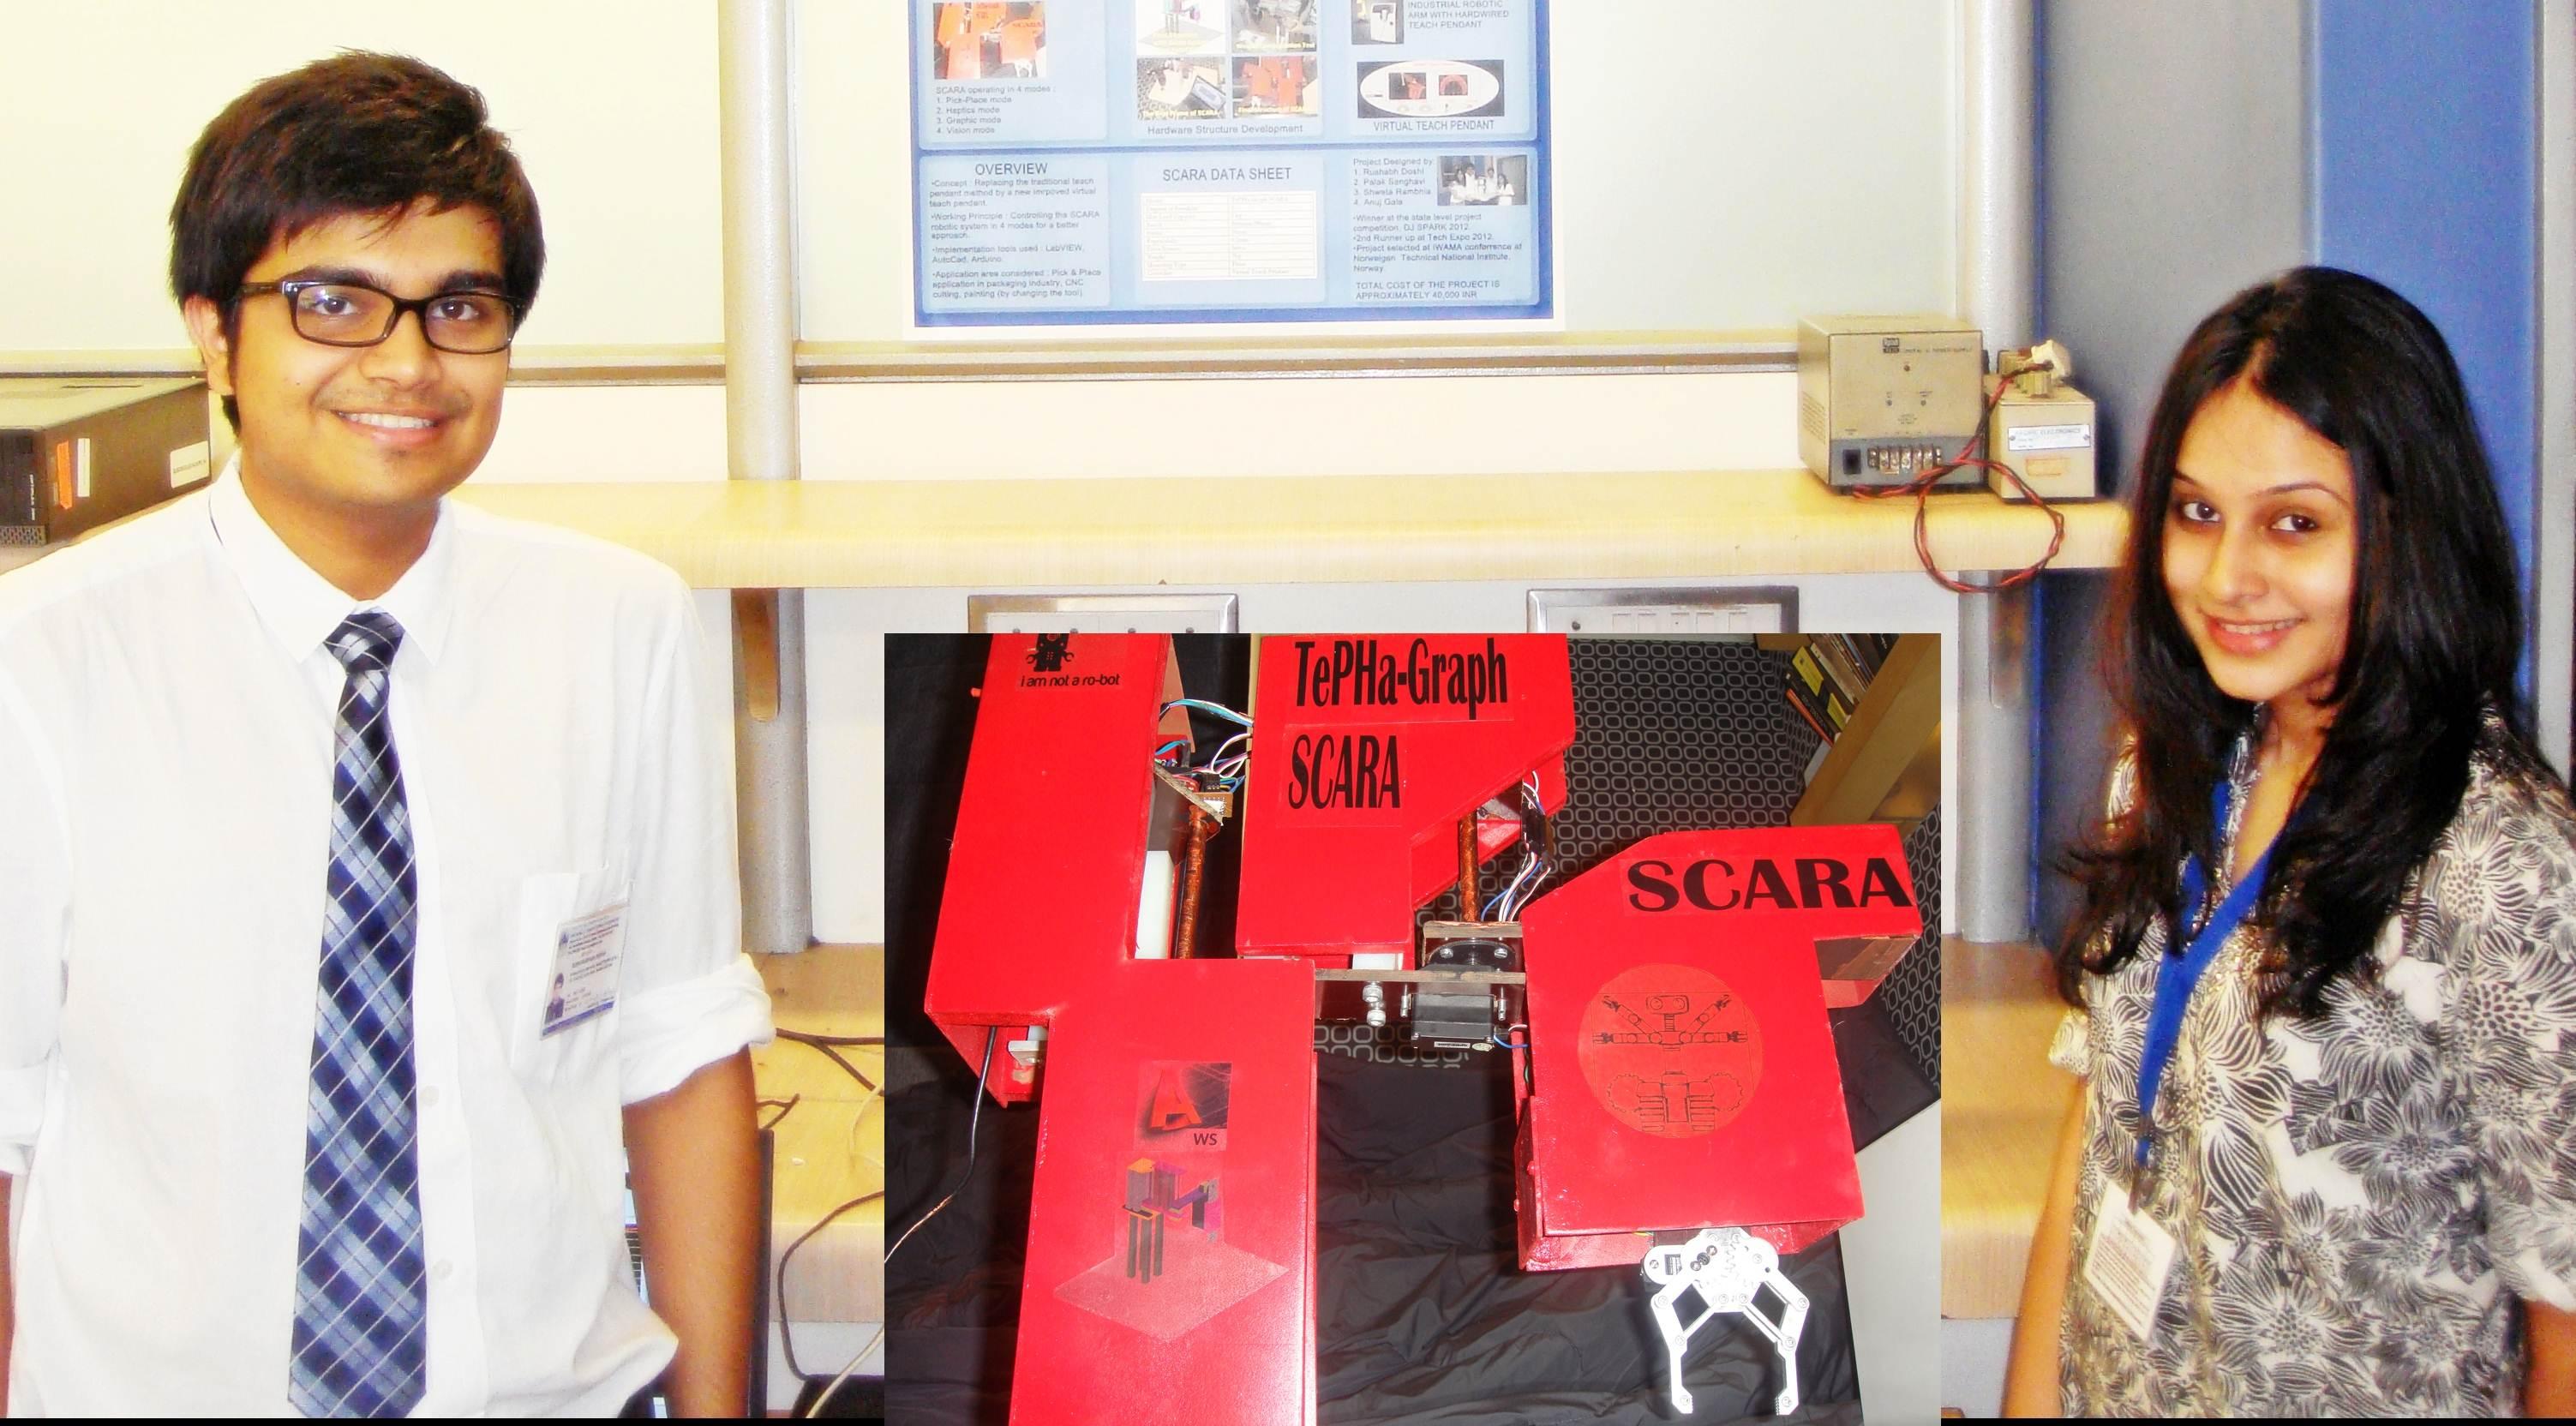 SCARA-2.JPG